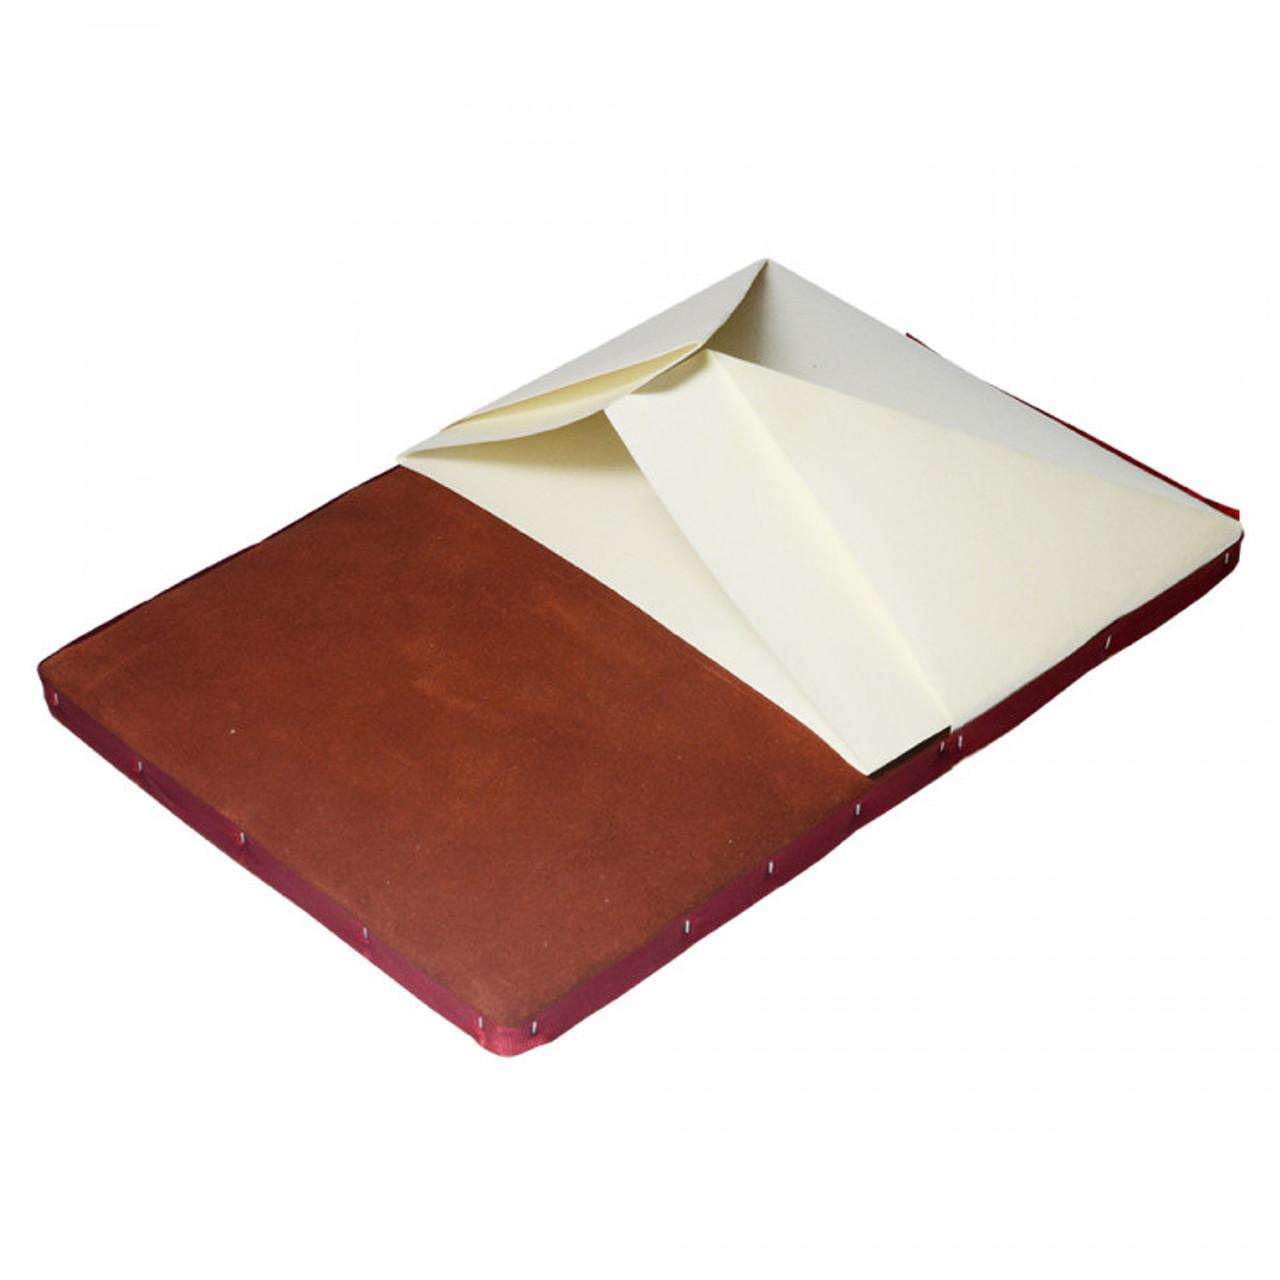 Professional Gilder's Cushion with  vellum draft shield.